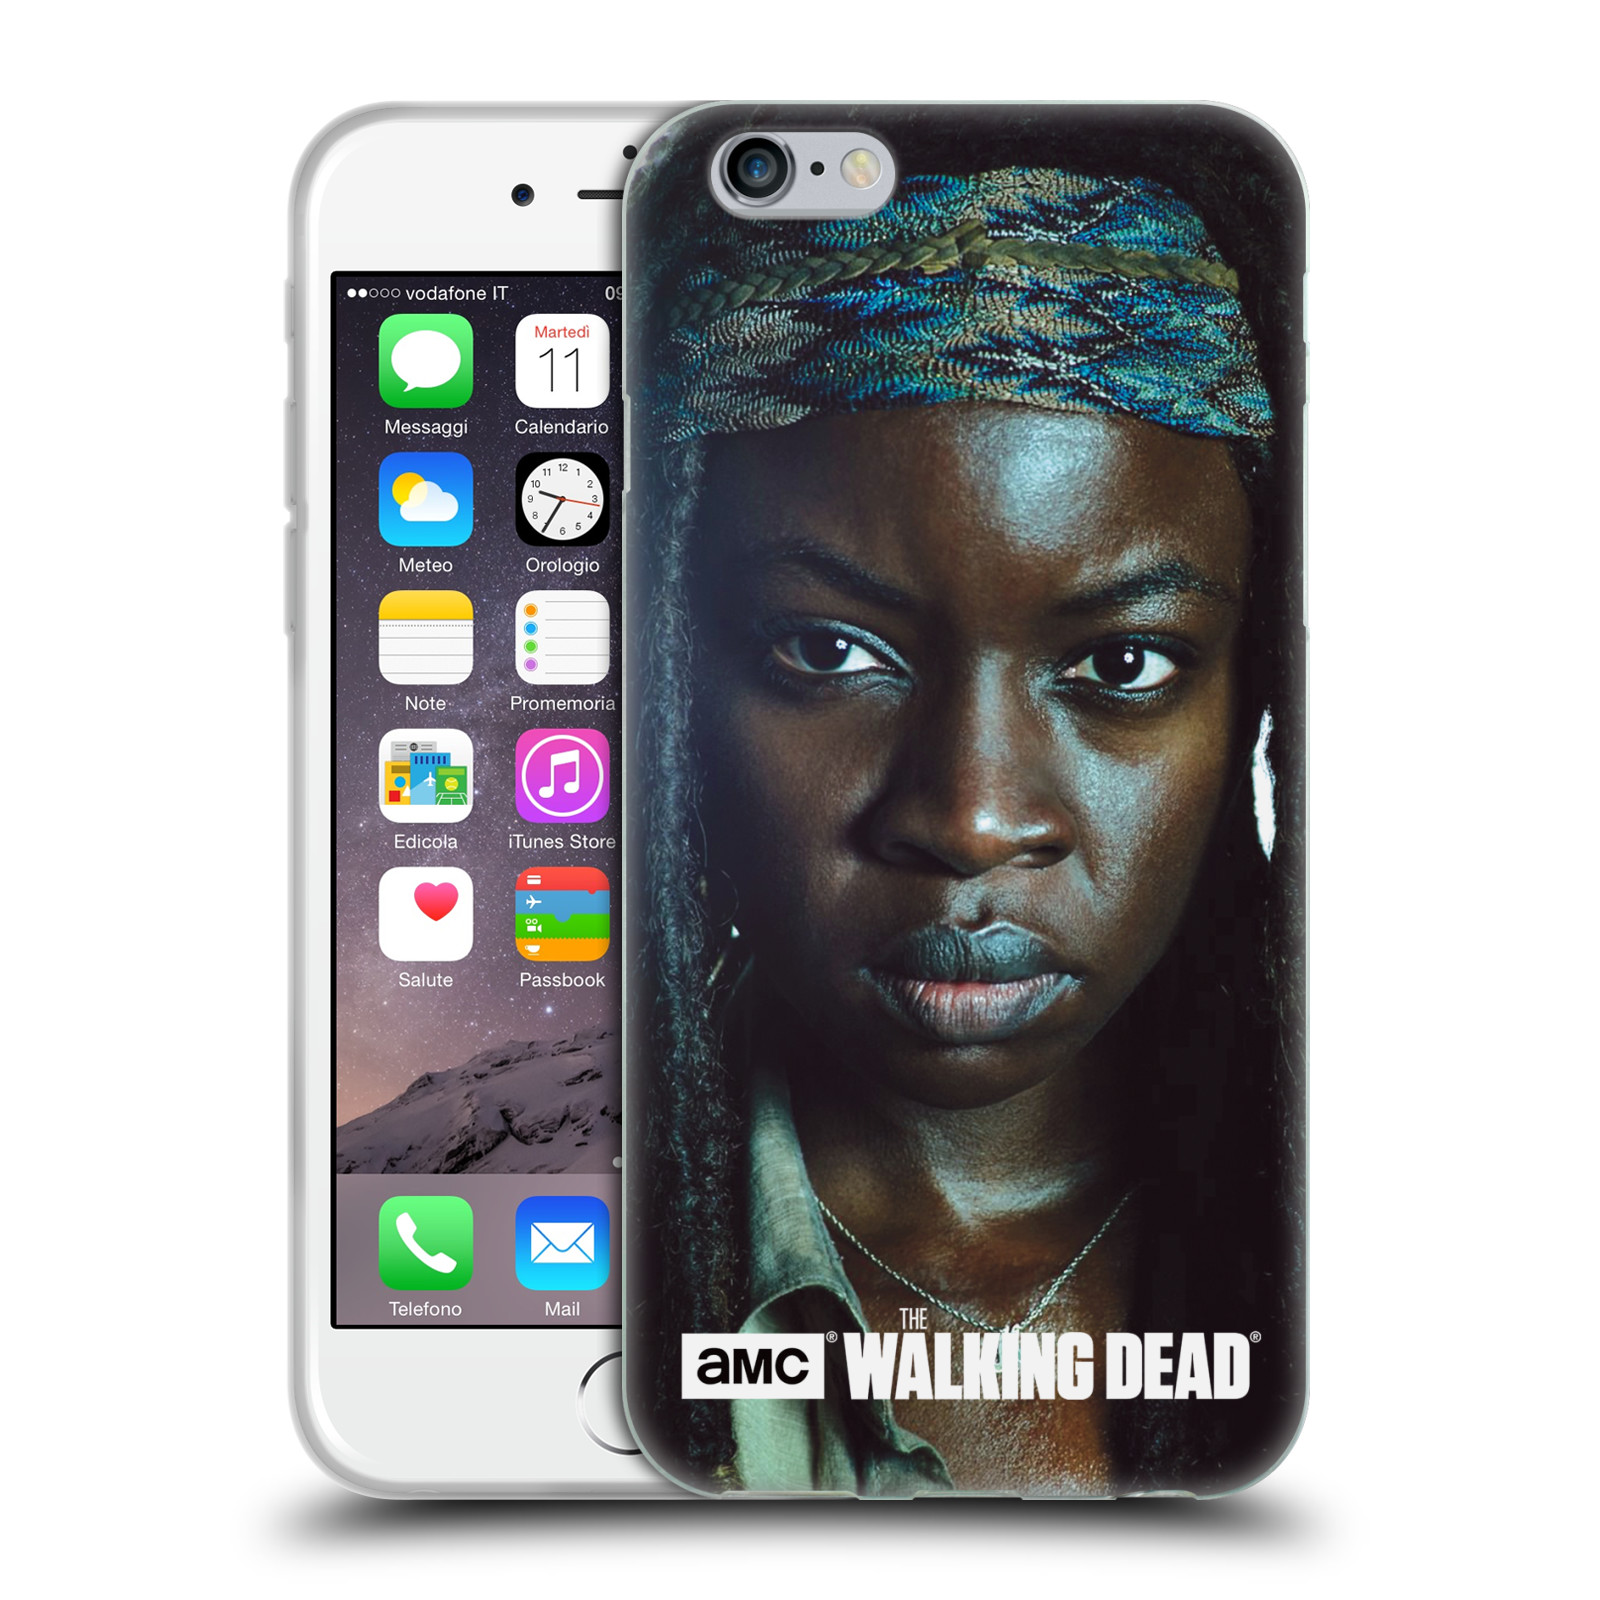 HEAD CASE silikonový obal na mobil Apple Iphone 6 / 6S originální potisk Walking Dead postavy Michonne